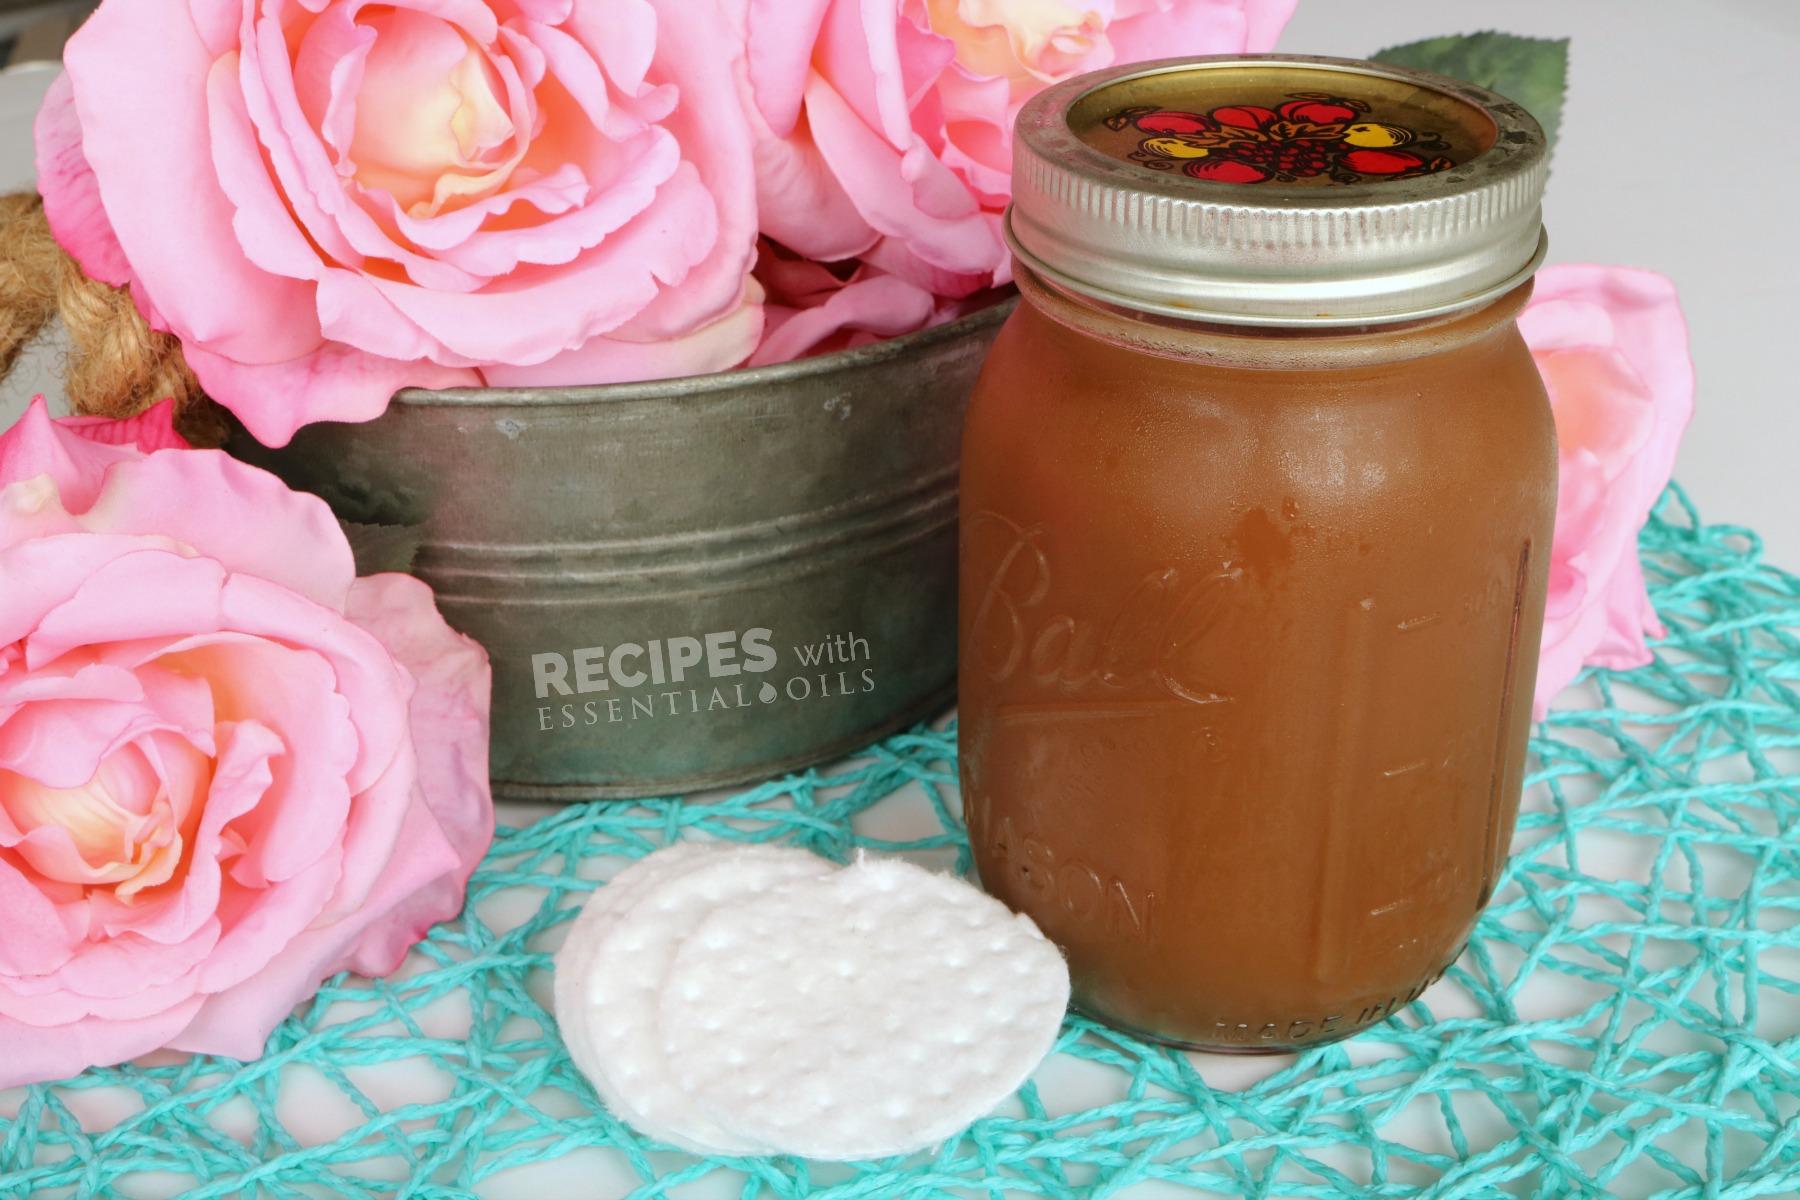 Beauty Recipes - Recipes with Essential Oils